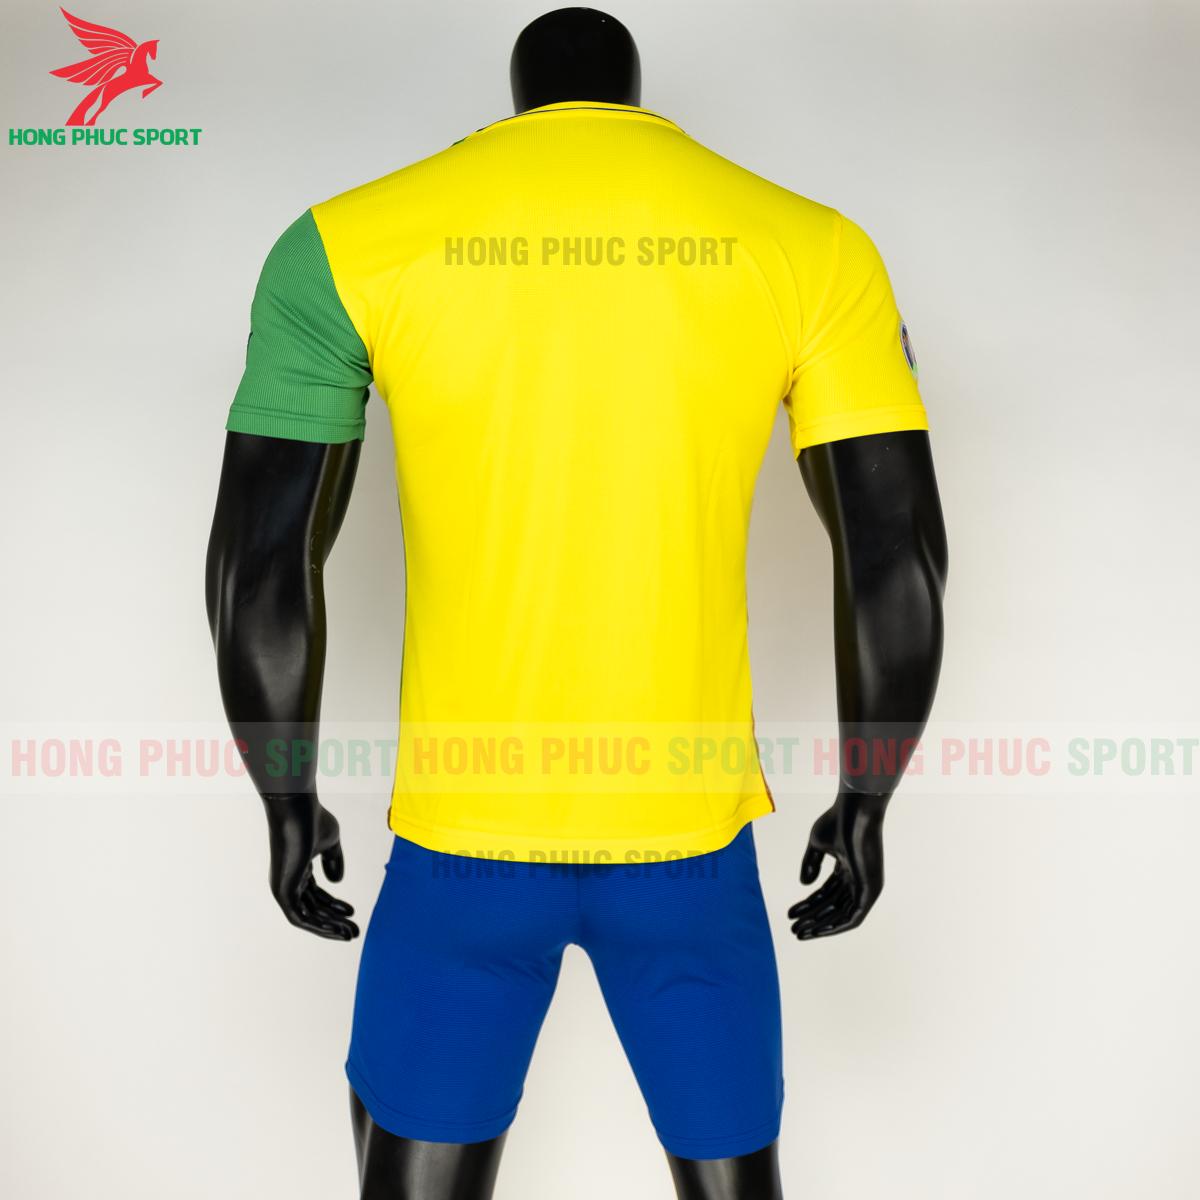 https://cdn.hongphucsport.com/unsafe/s4.shopbay.vn/files/285/ao-tuyen-brazil-hang-det-phien-ban-fan-acrra-8-5fa0fd898665a.png